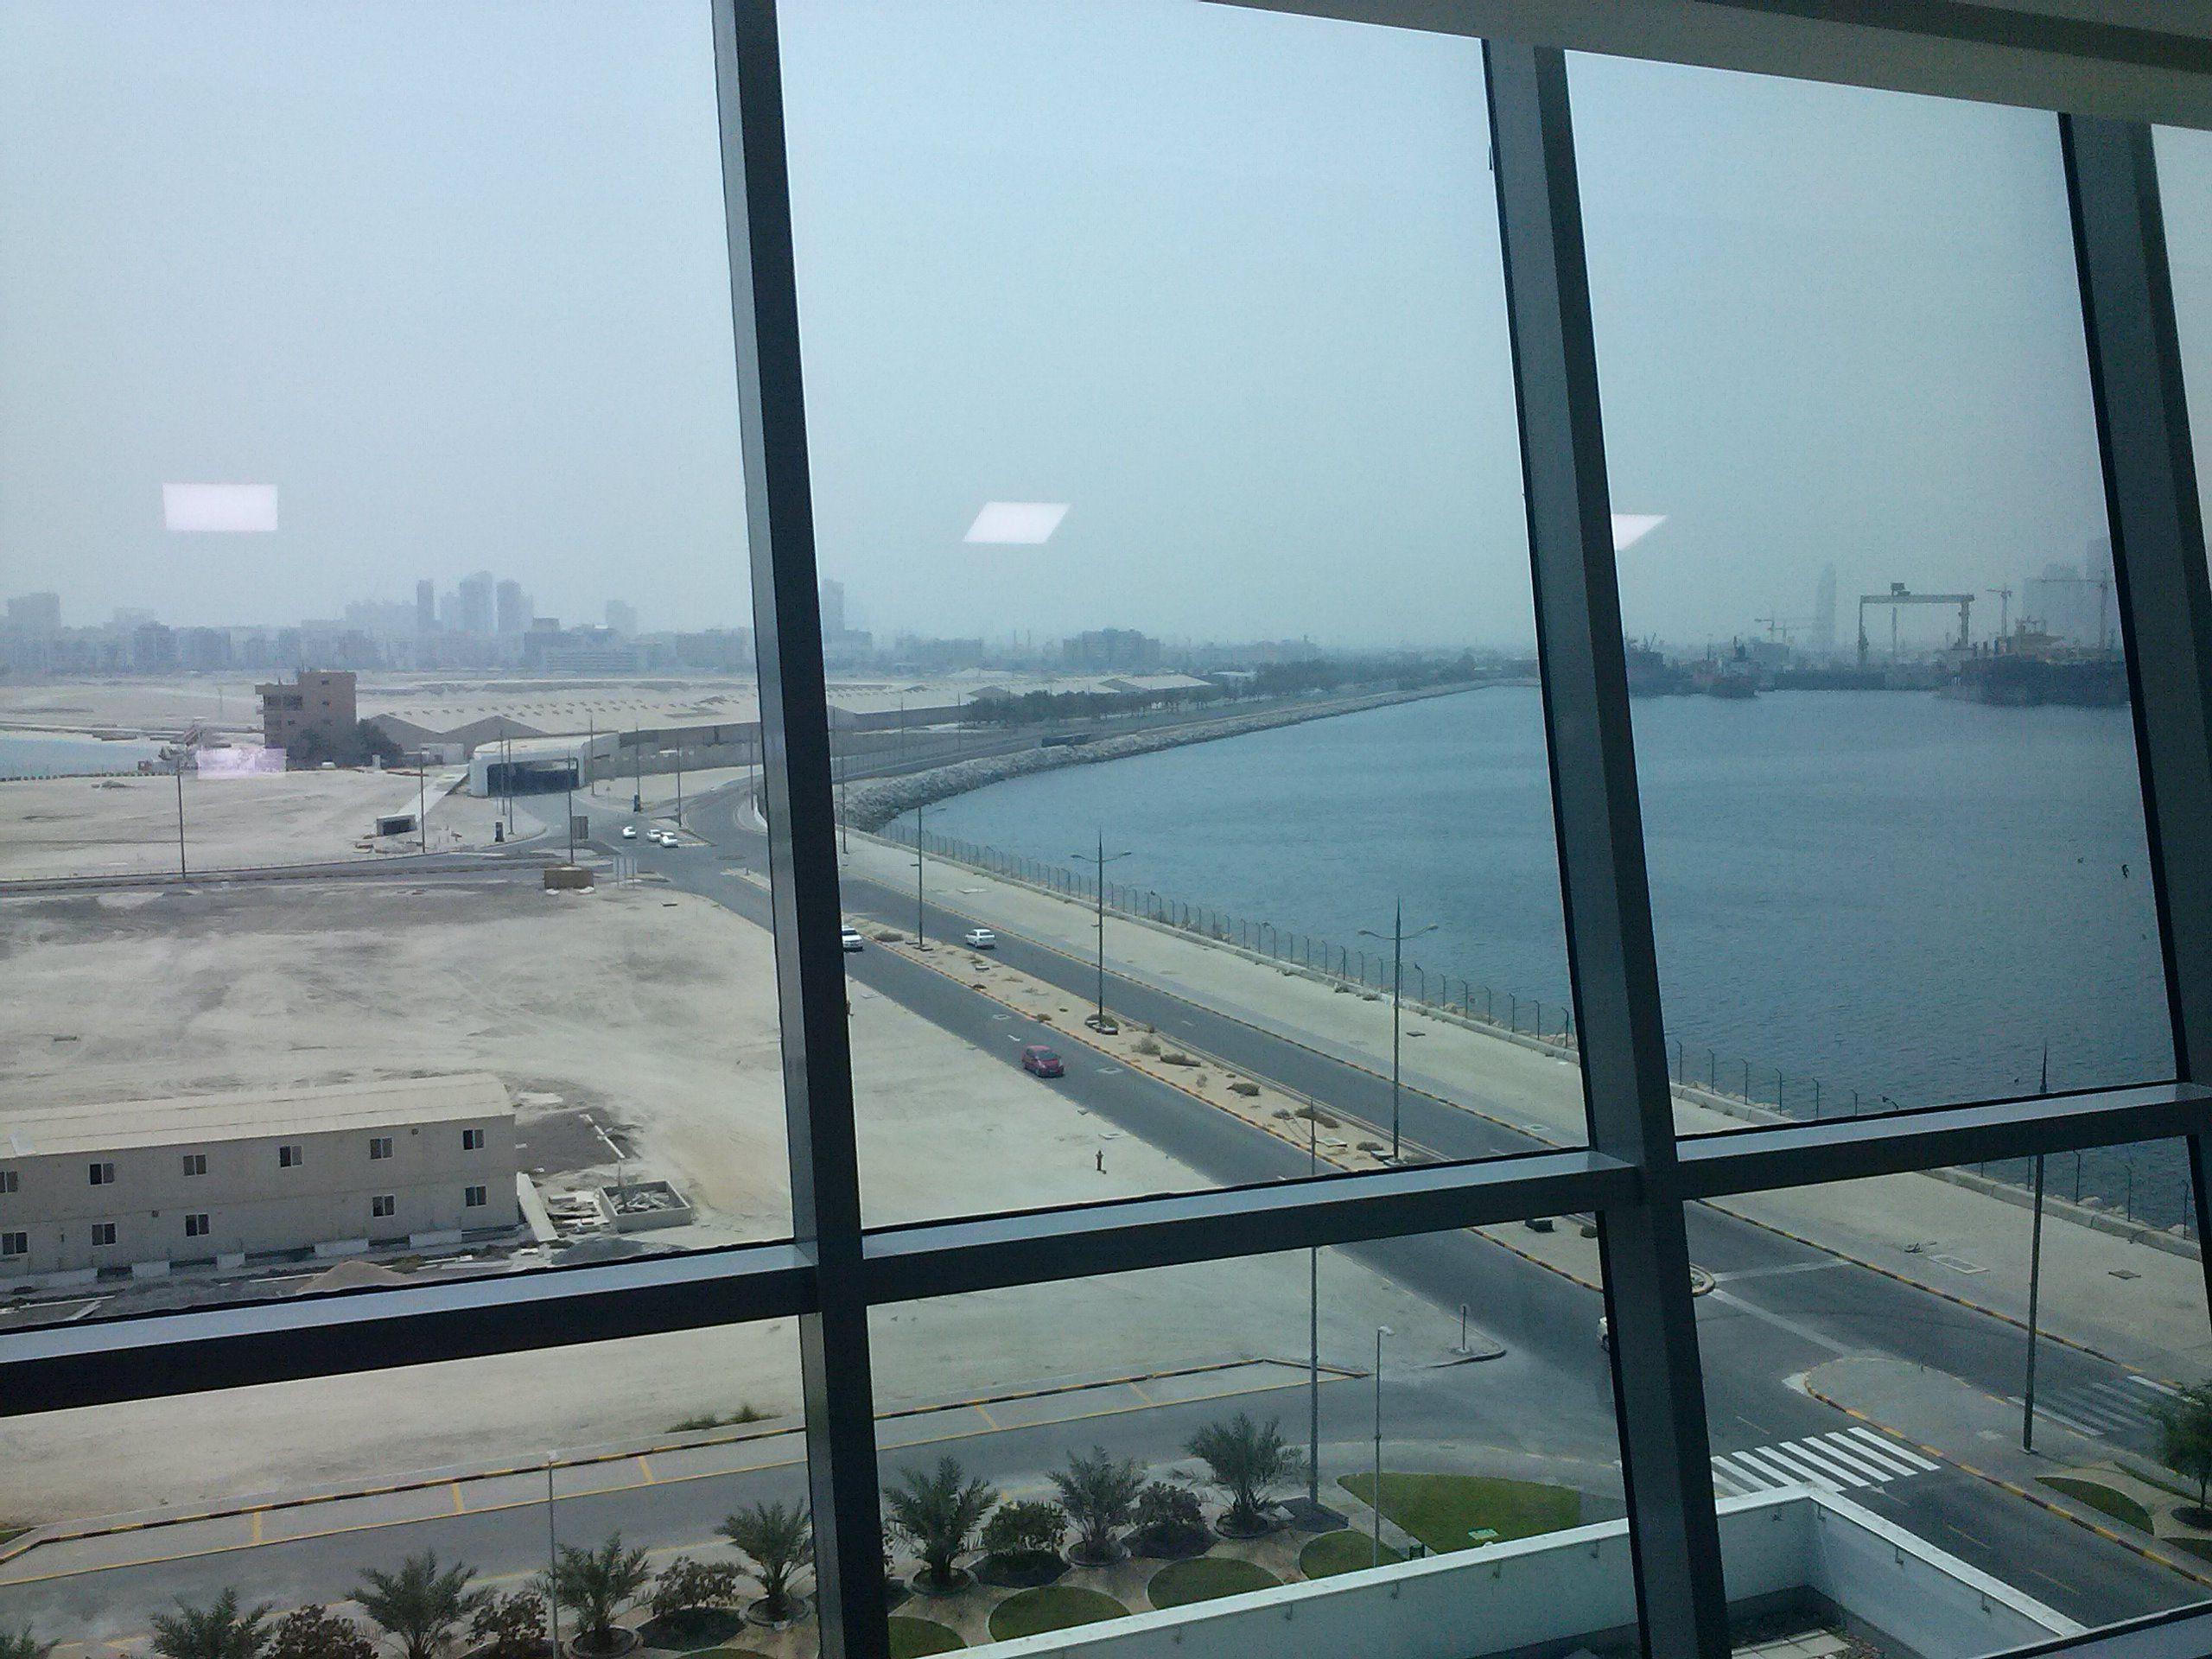 Dubai Maritime City W145a With Images Dubai Maritime City